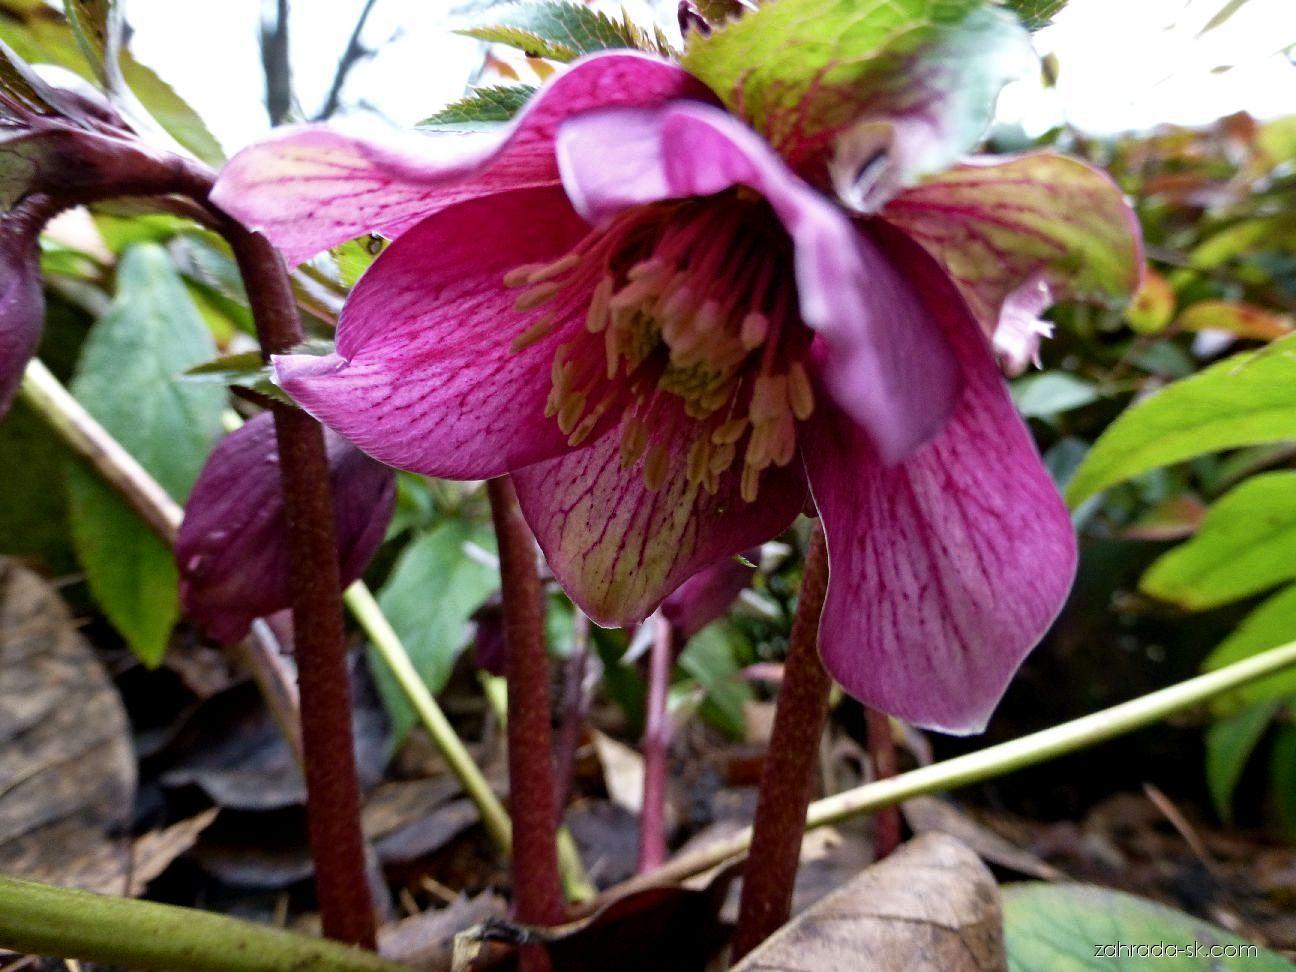 Čemerica - Helleborus purpurascens